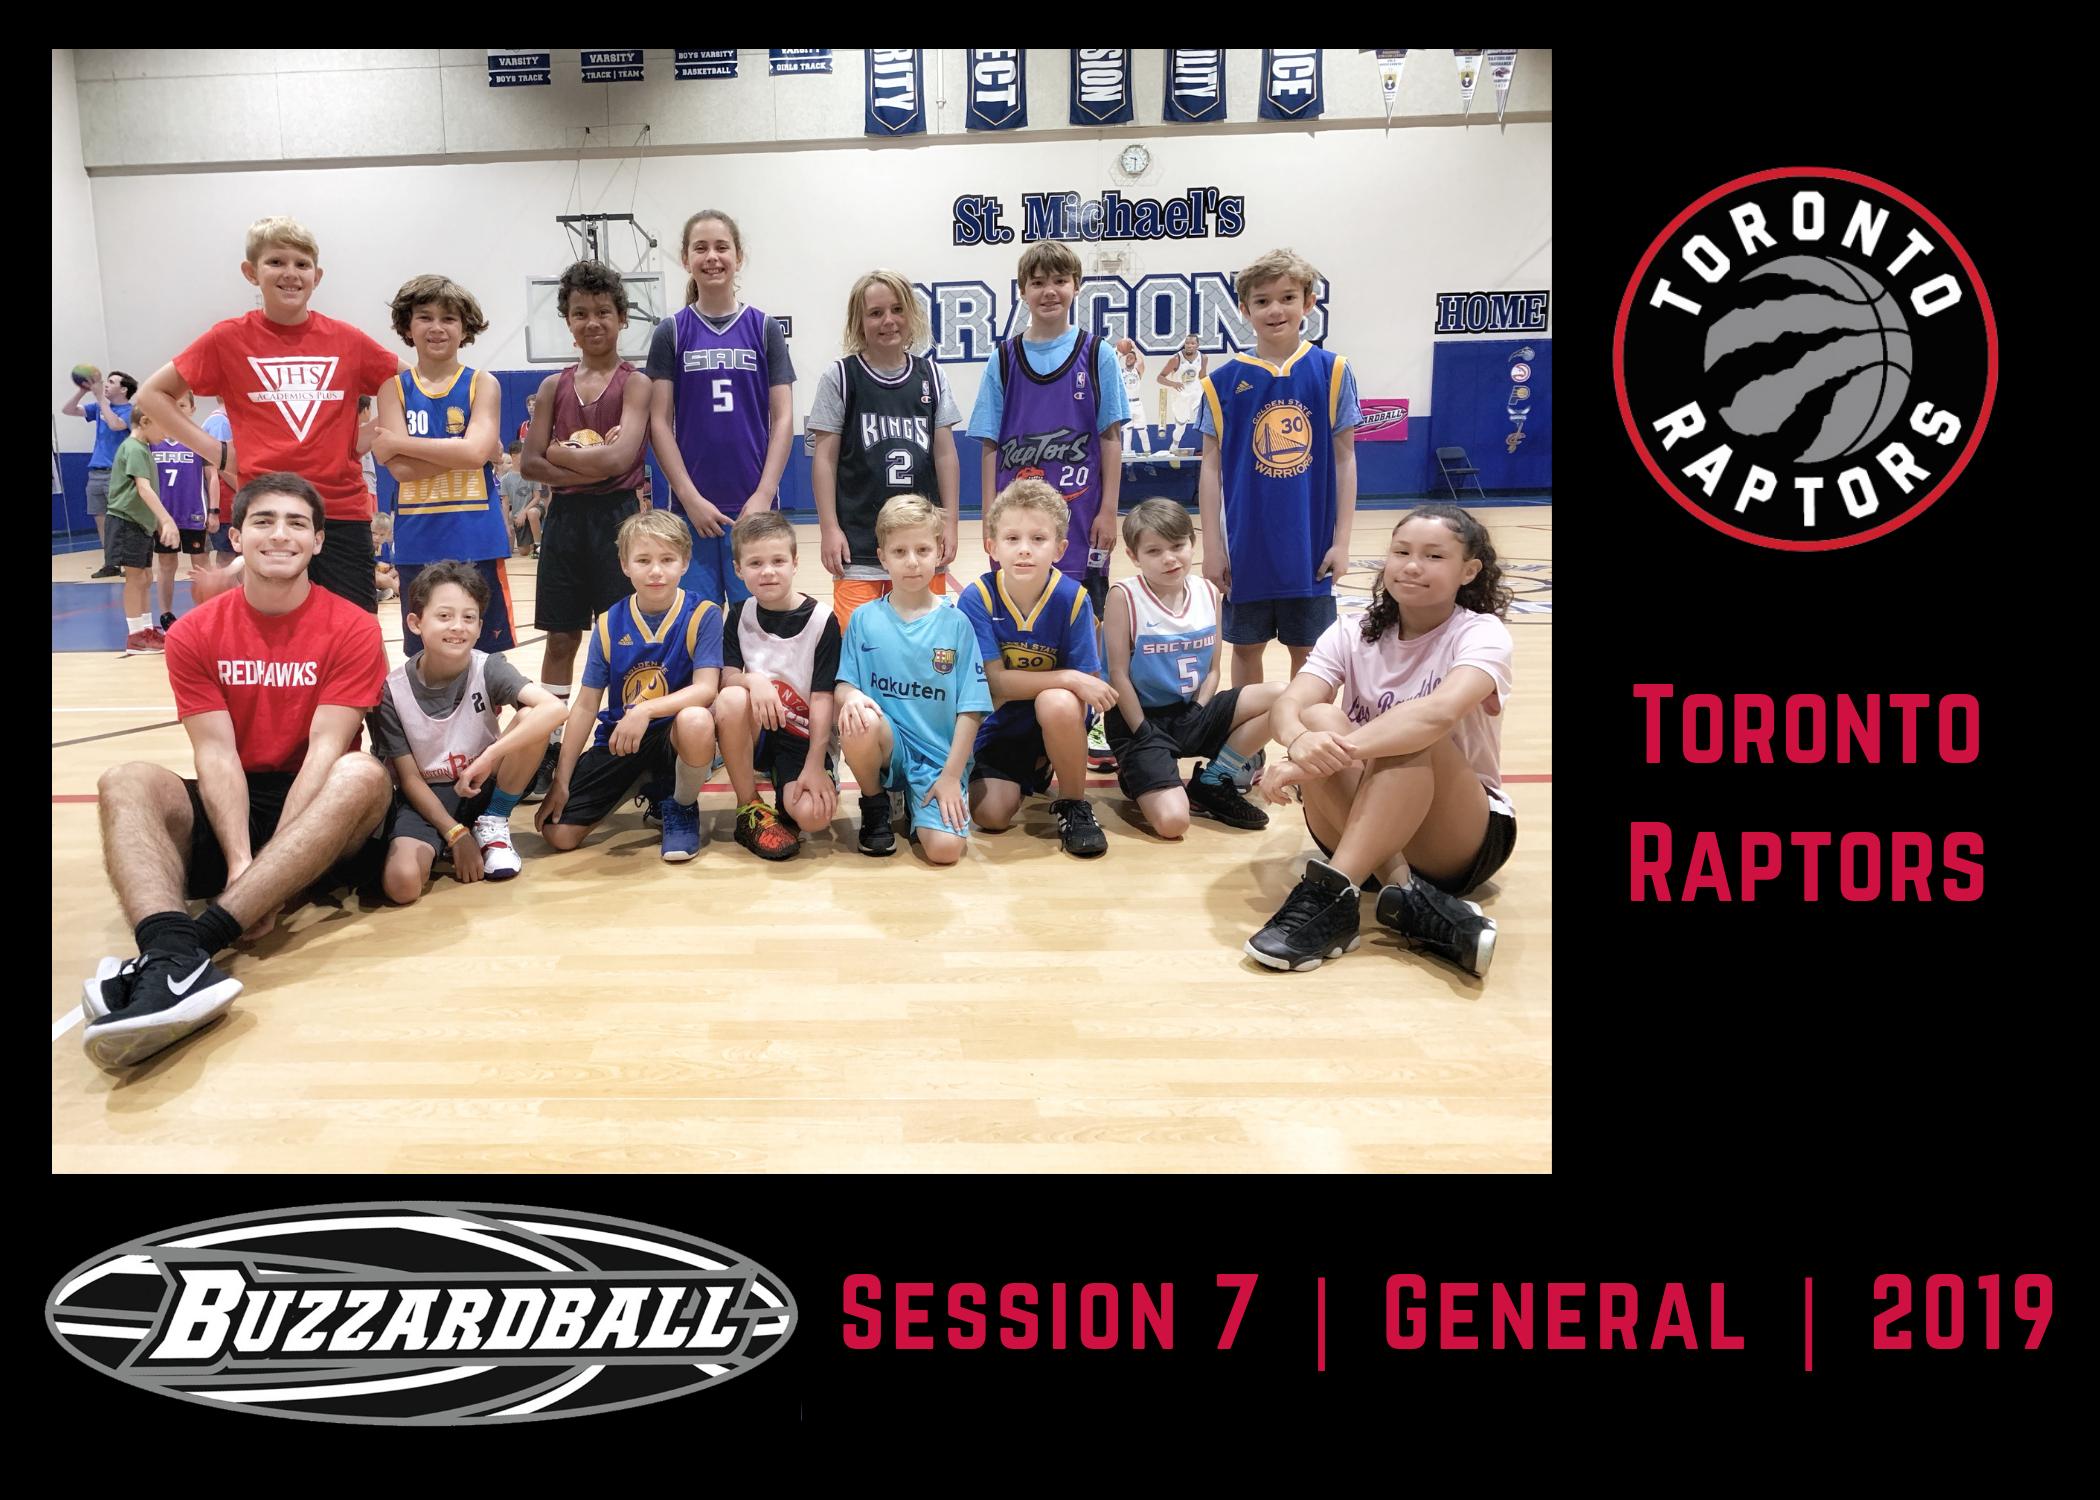 7 Toronto Raptors.png